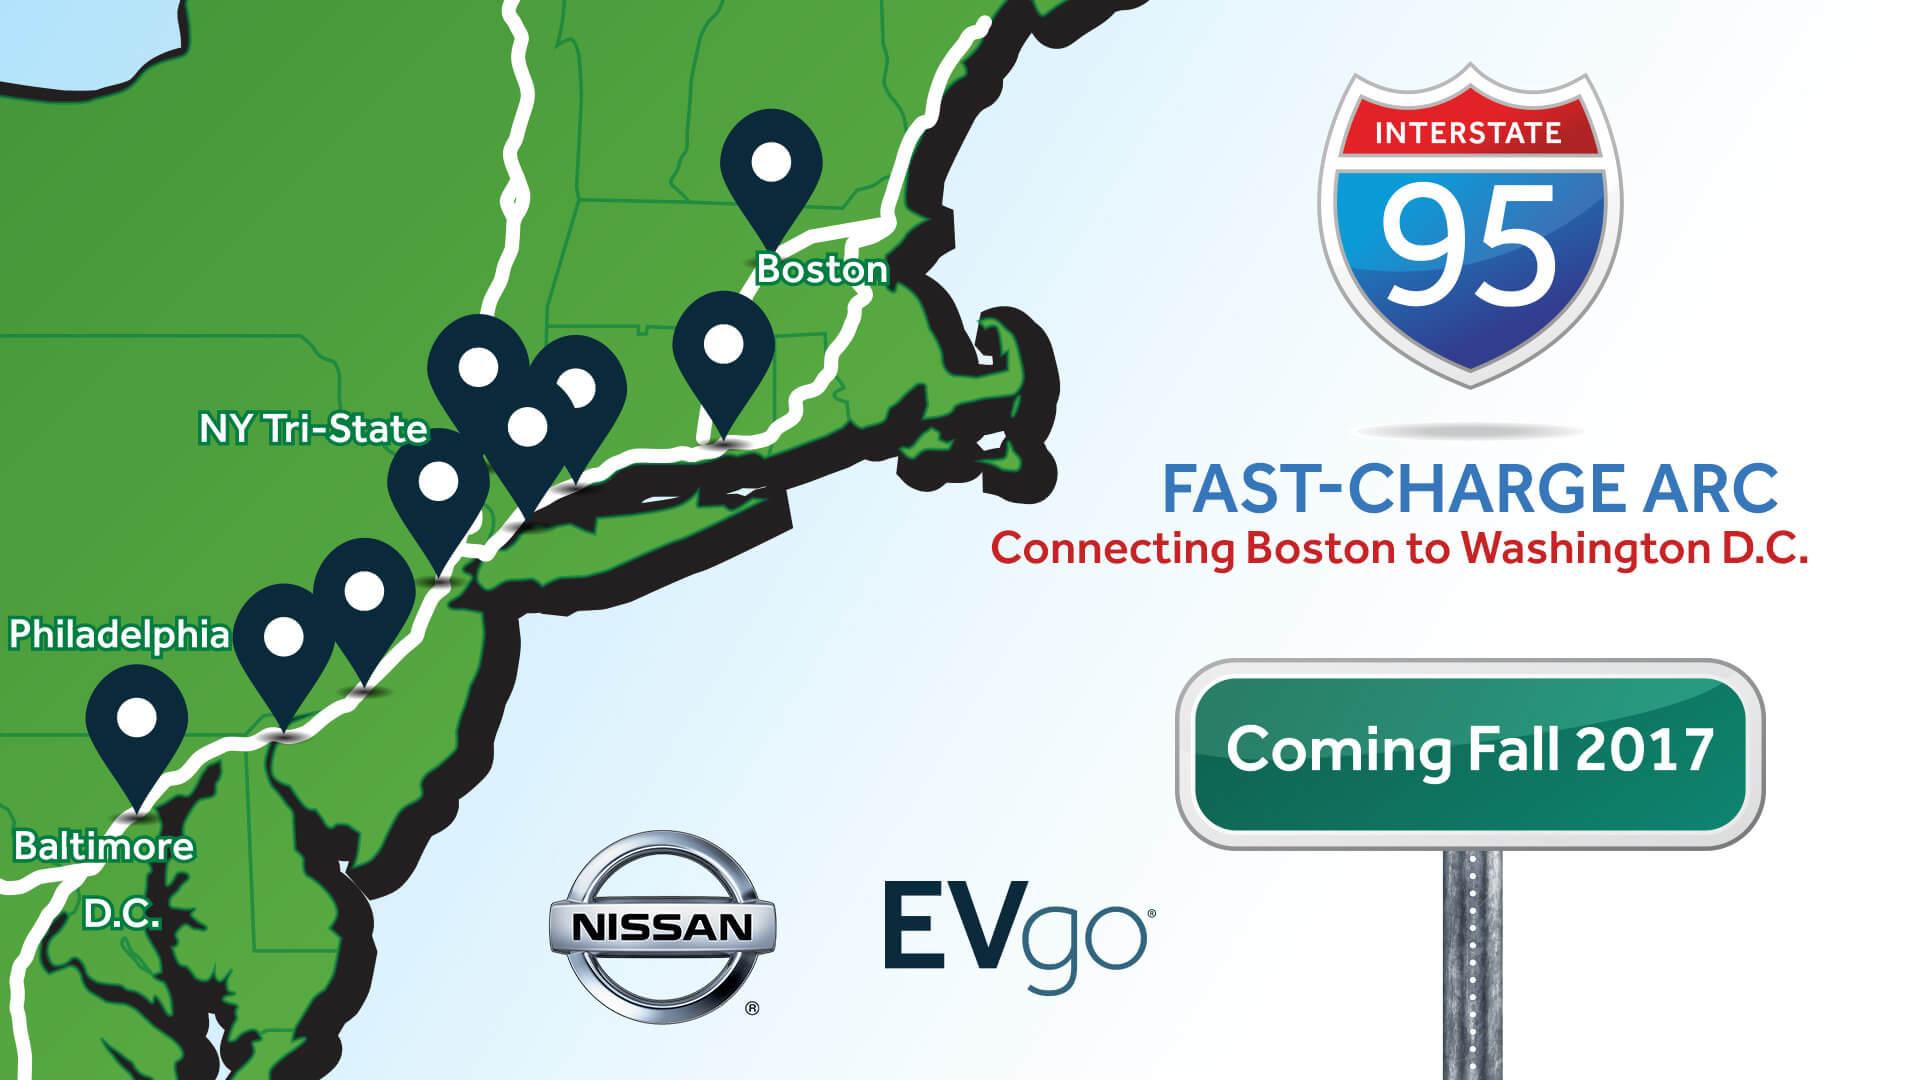 Nissan, EVgo Inter-City EV Charging Network to Span 500 Miles